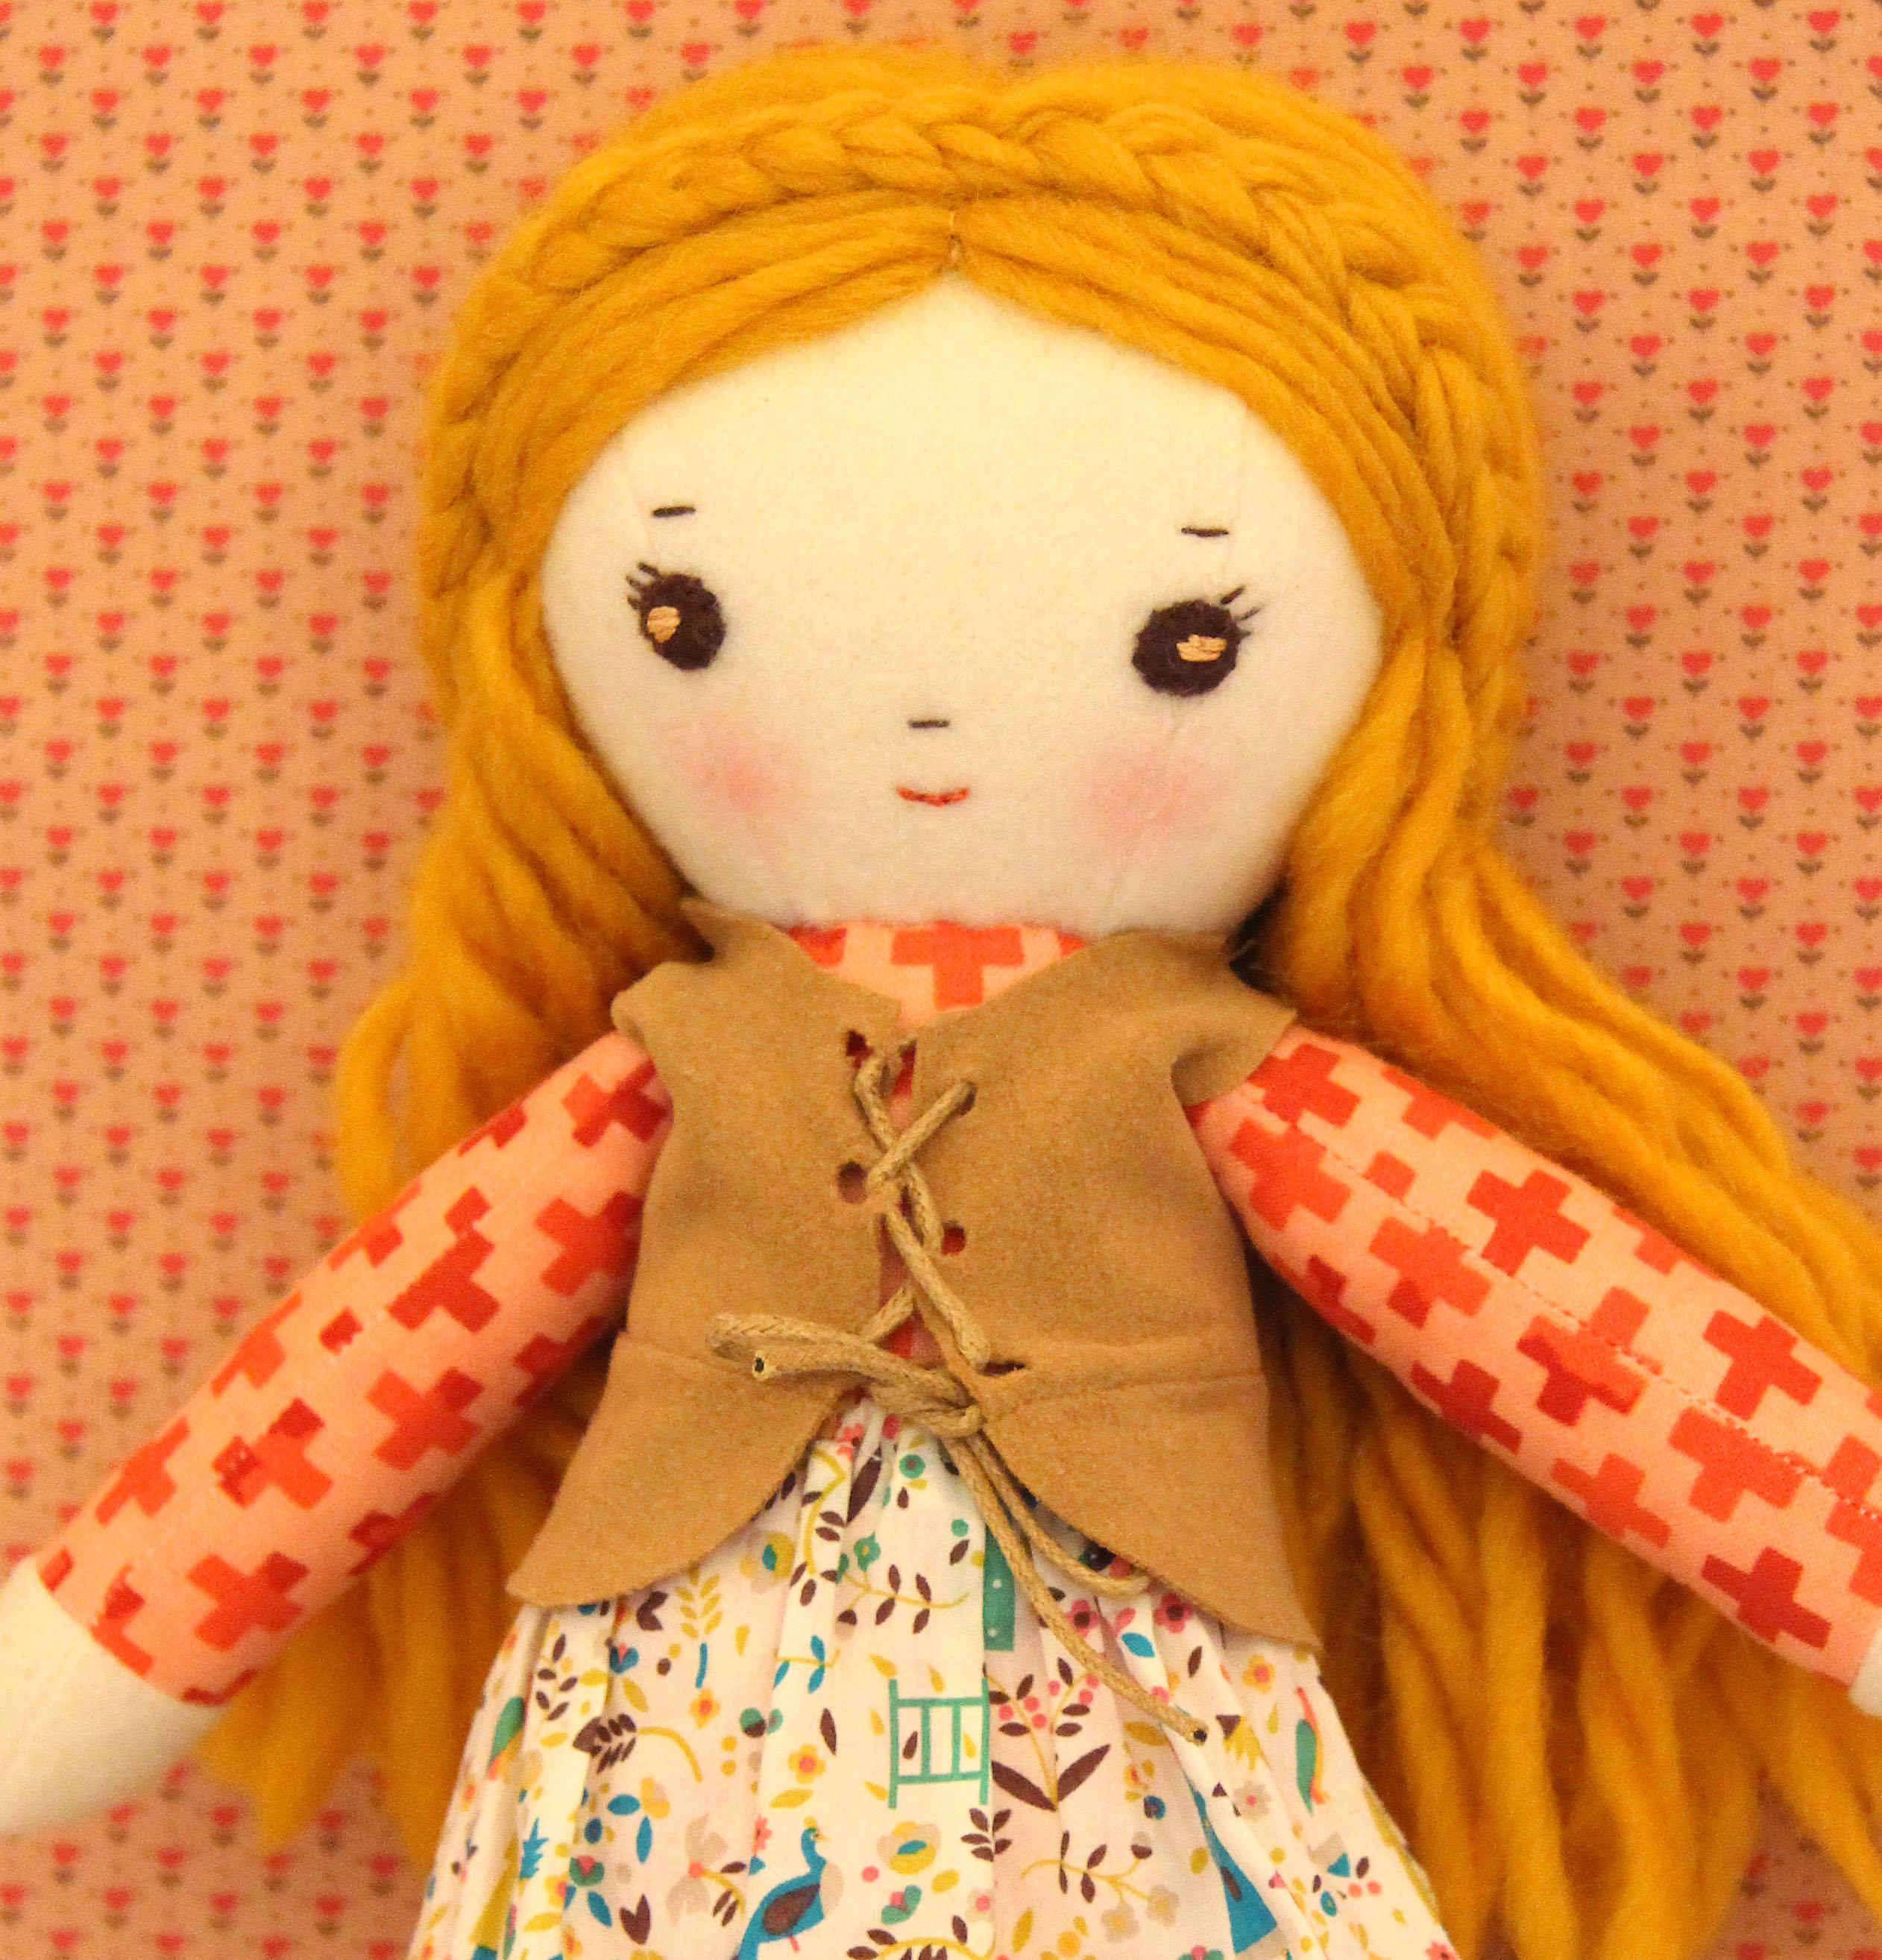 Elsa doll sewing pattern